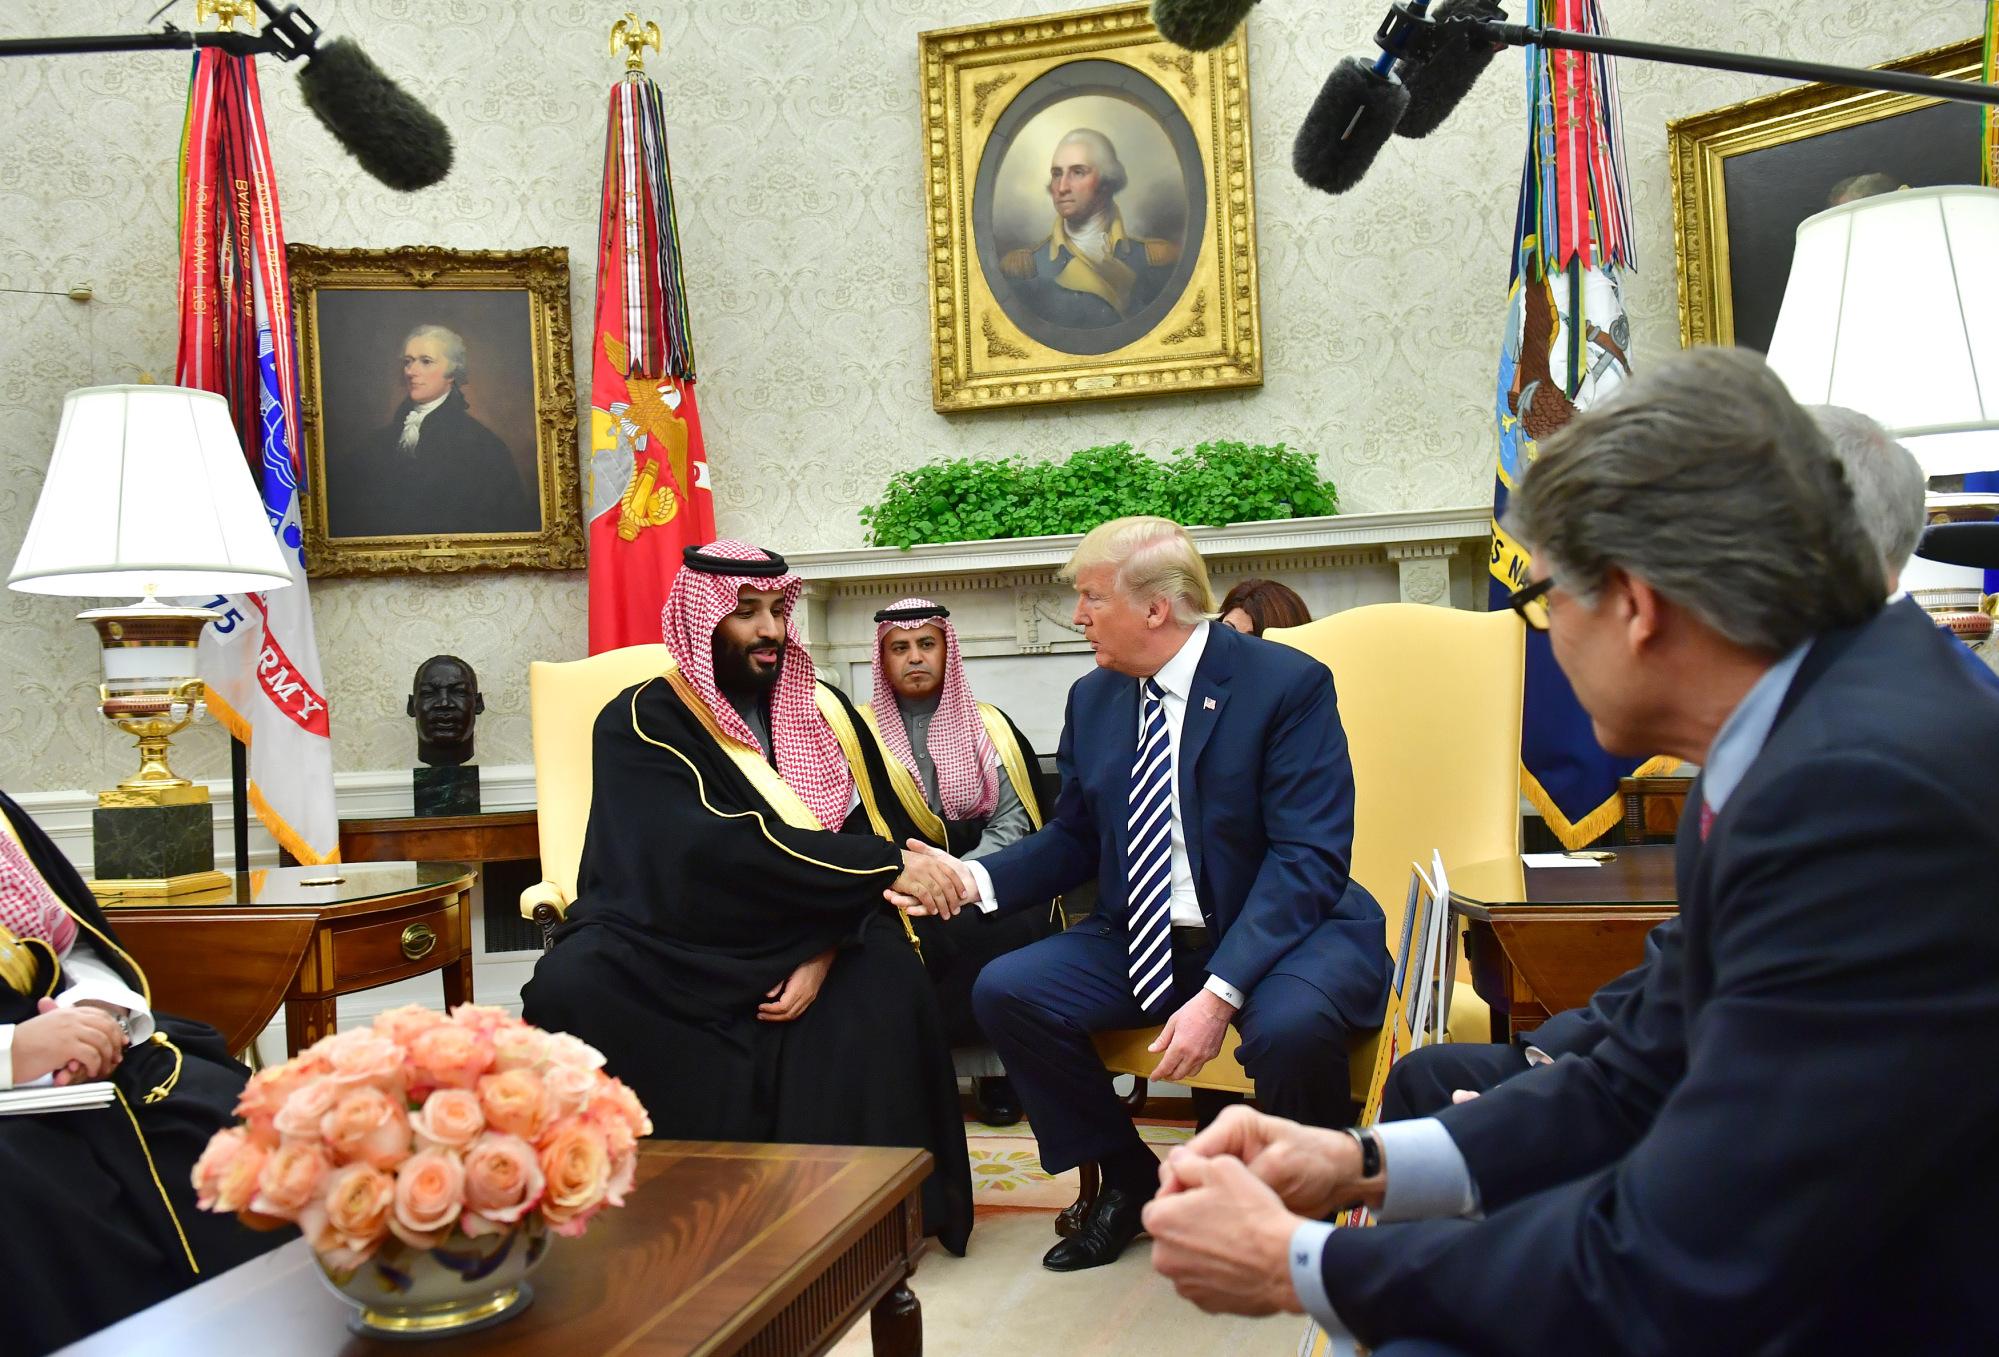 Ritz-Carlton Crackdown Still Haunts The New Saudi Arabia